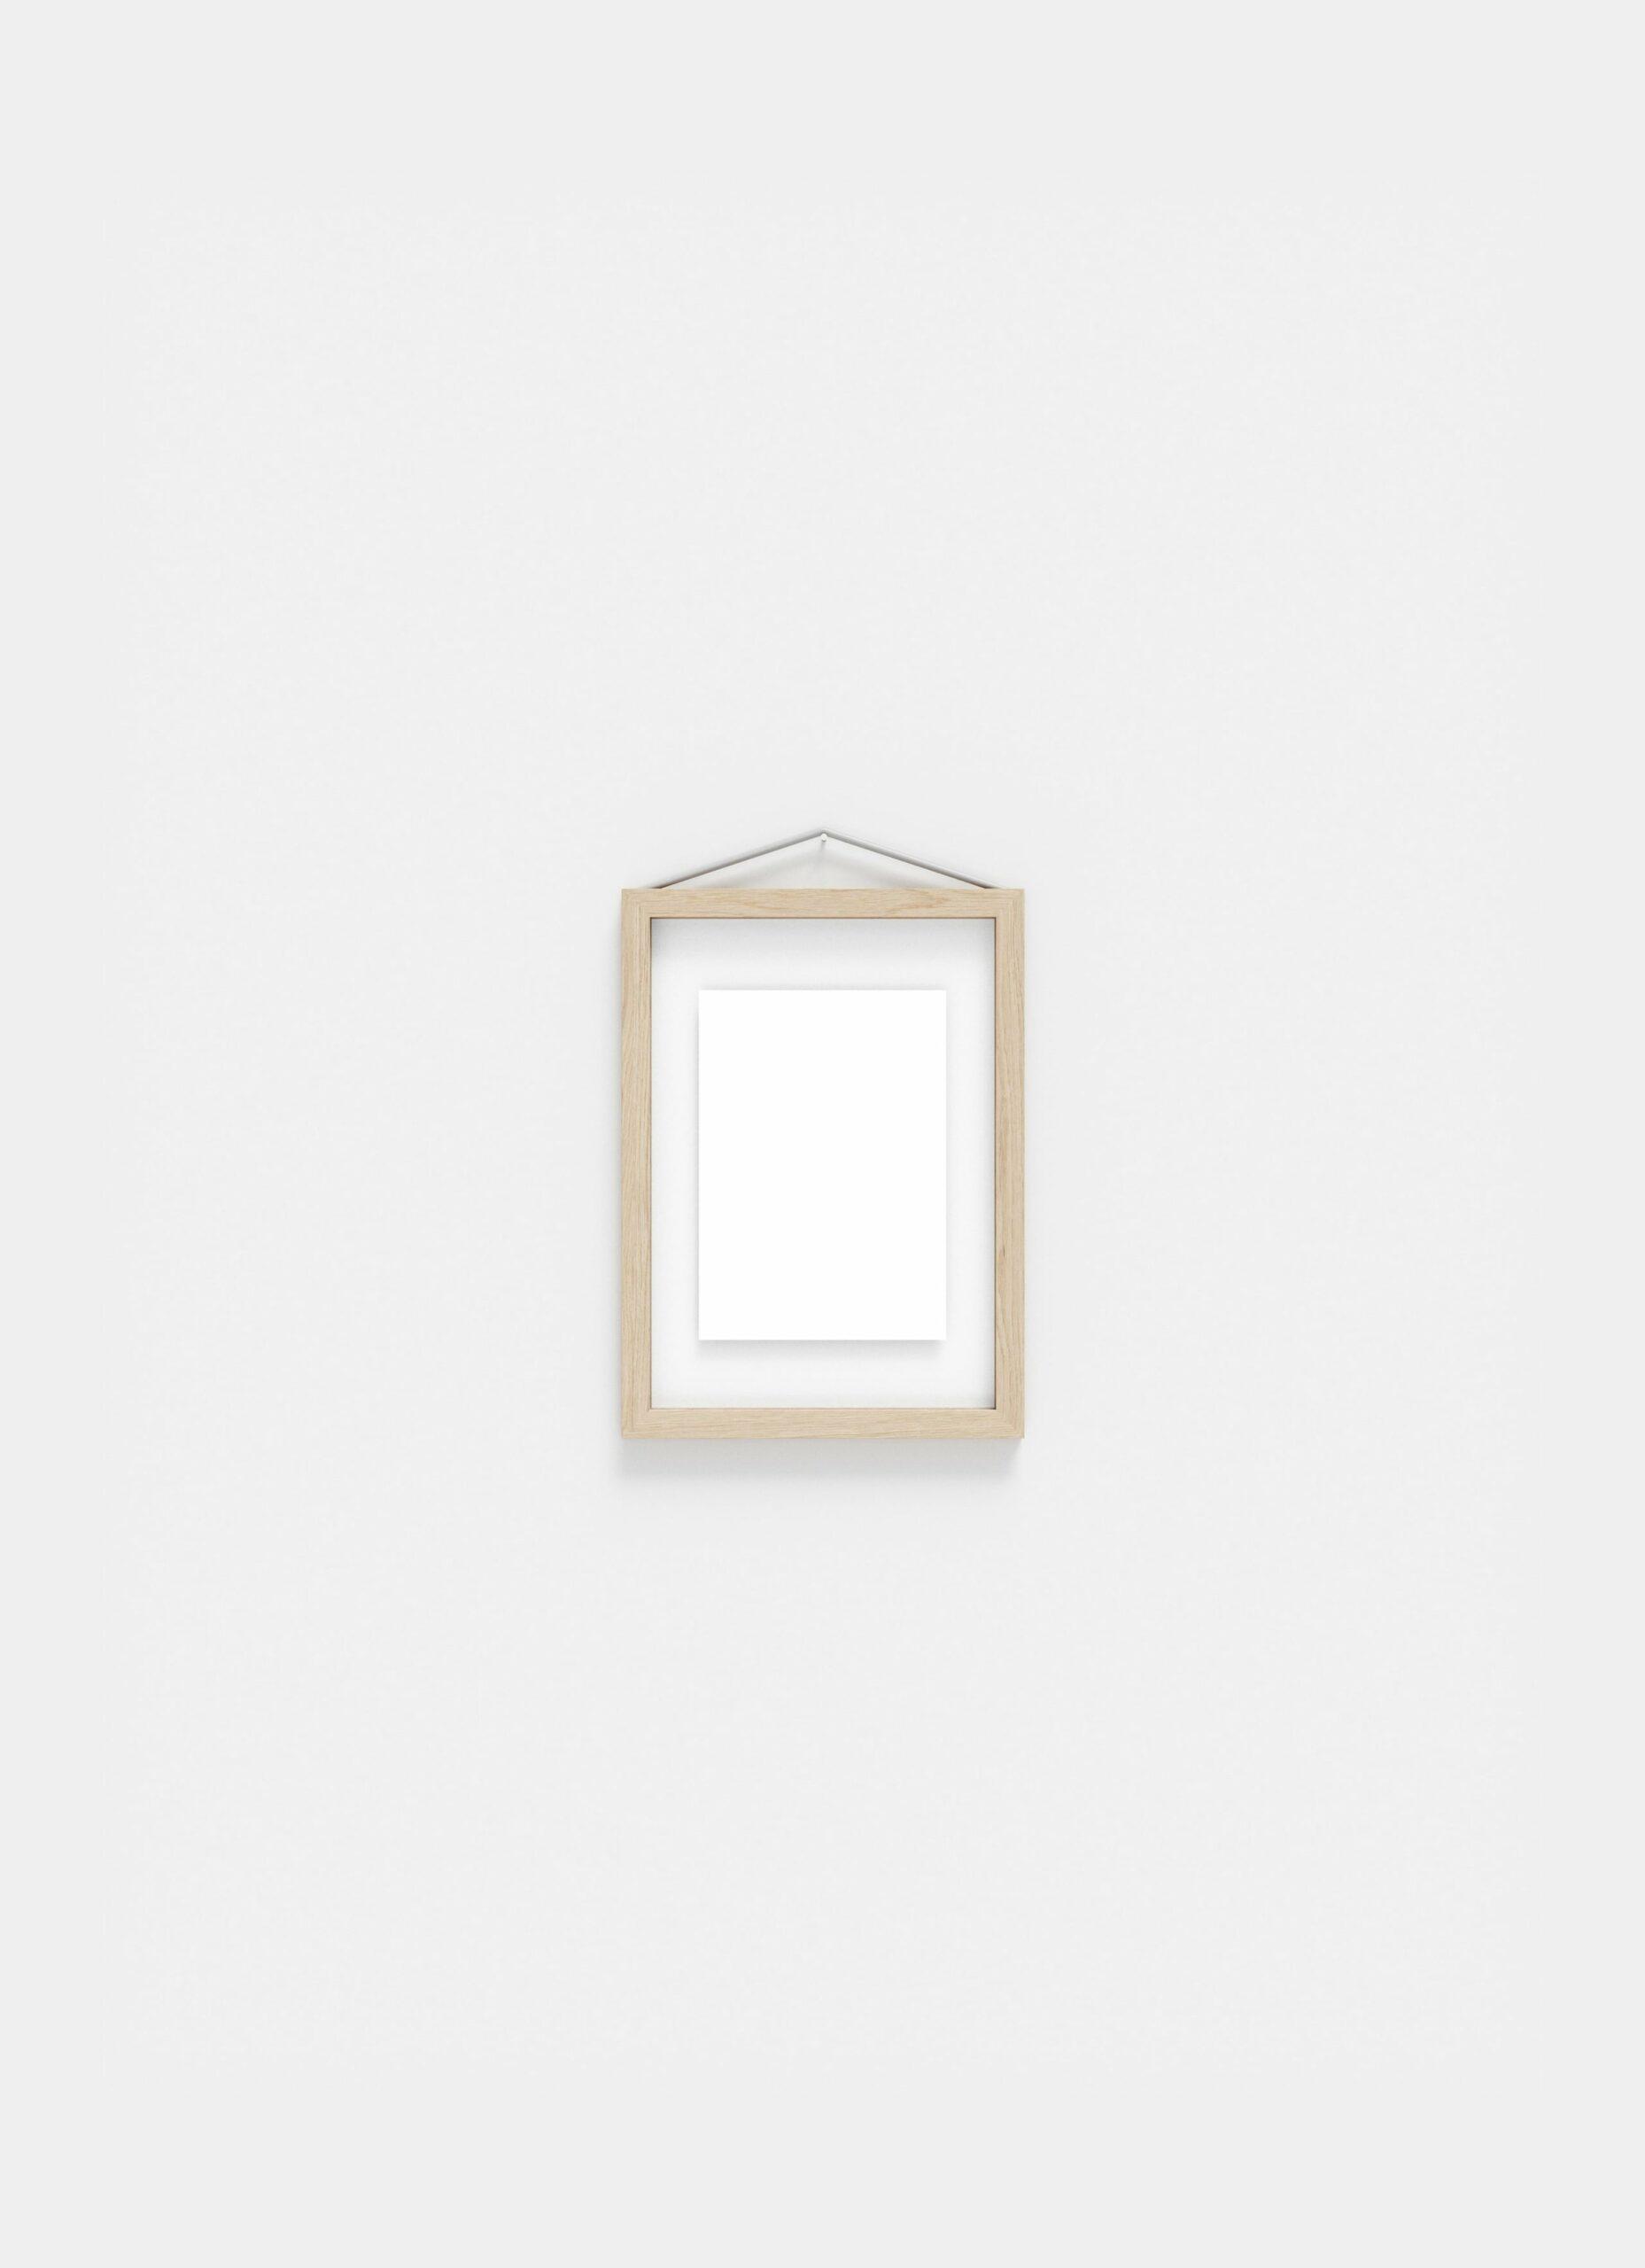 Moebe Frame - Ash - small - A5